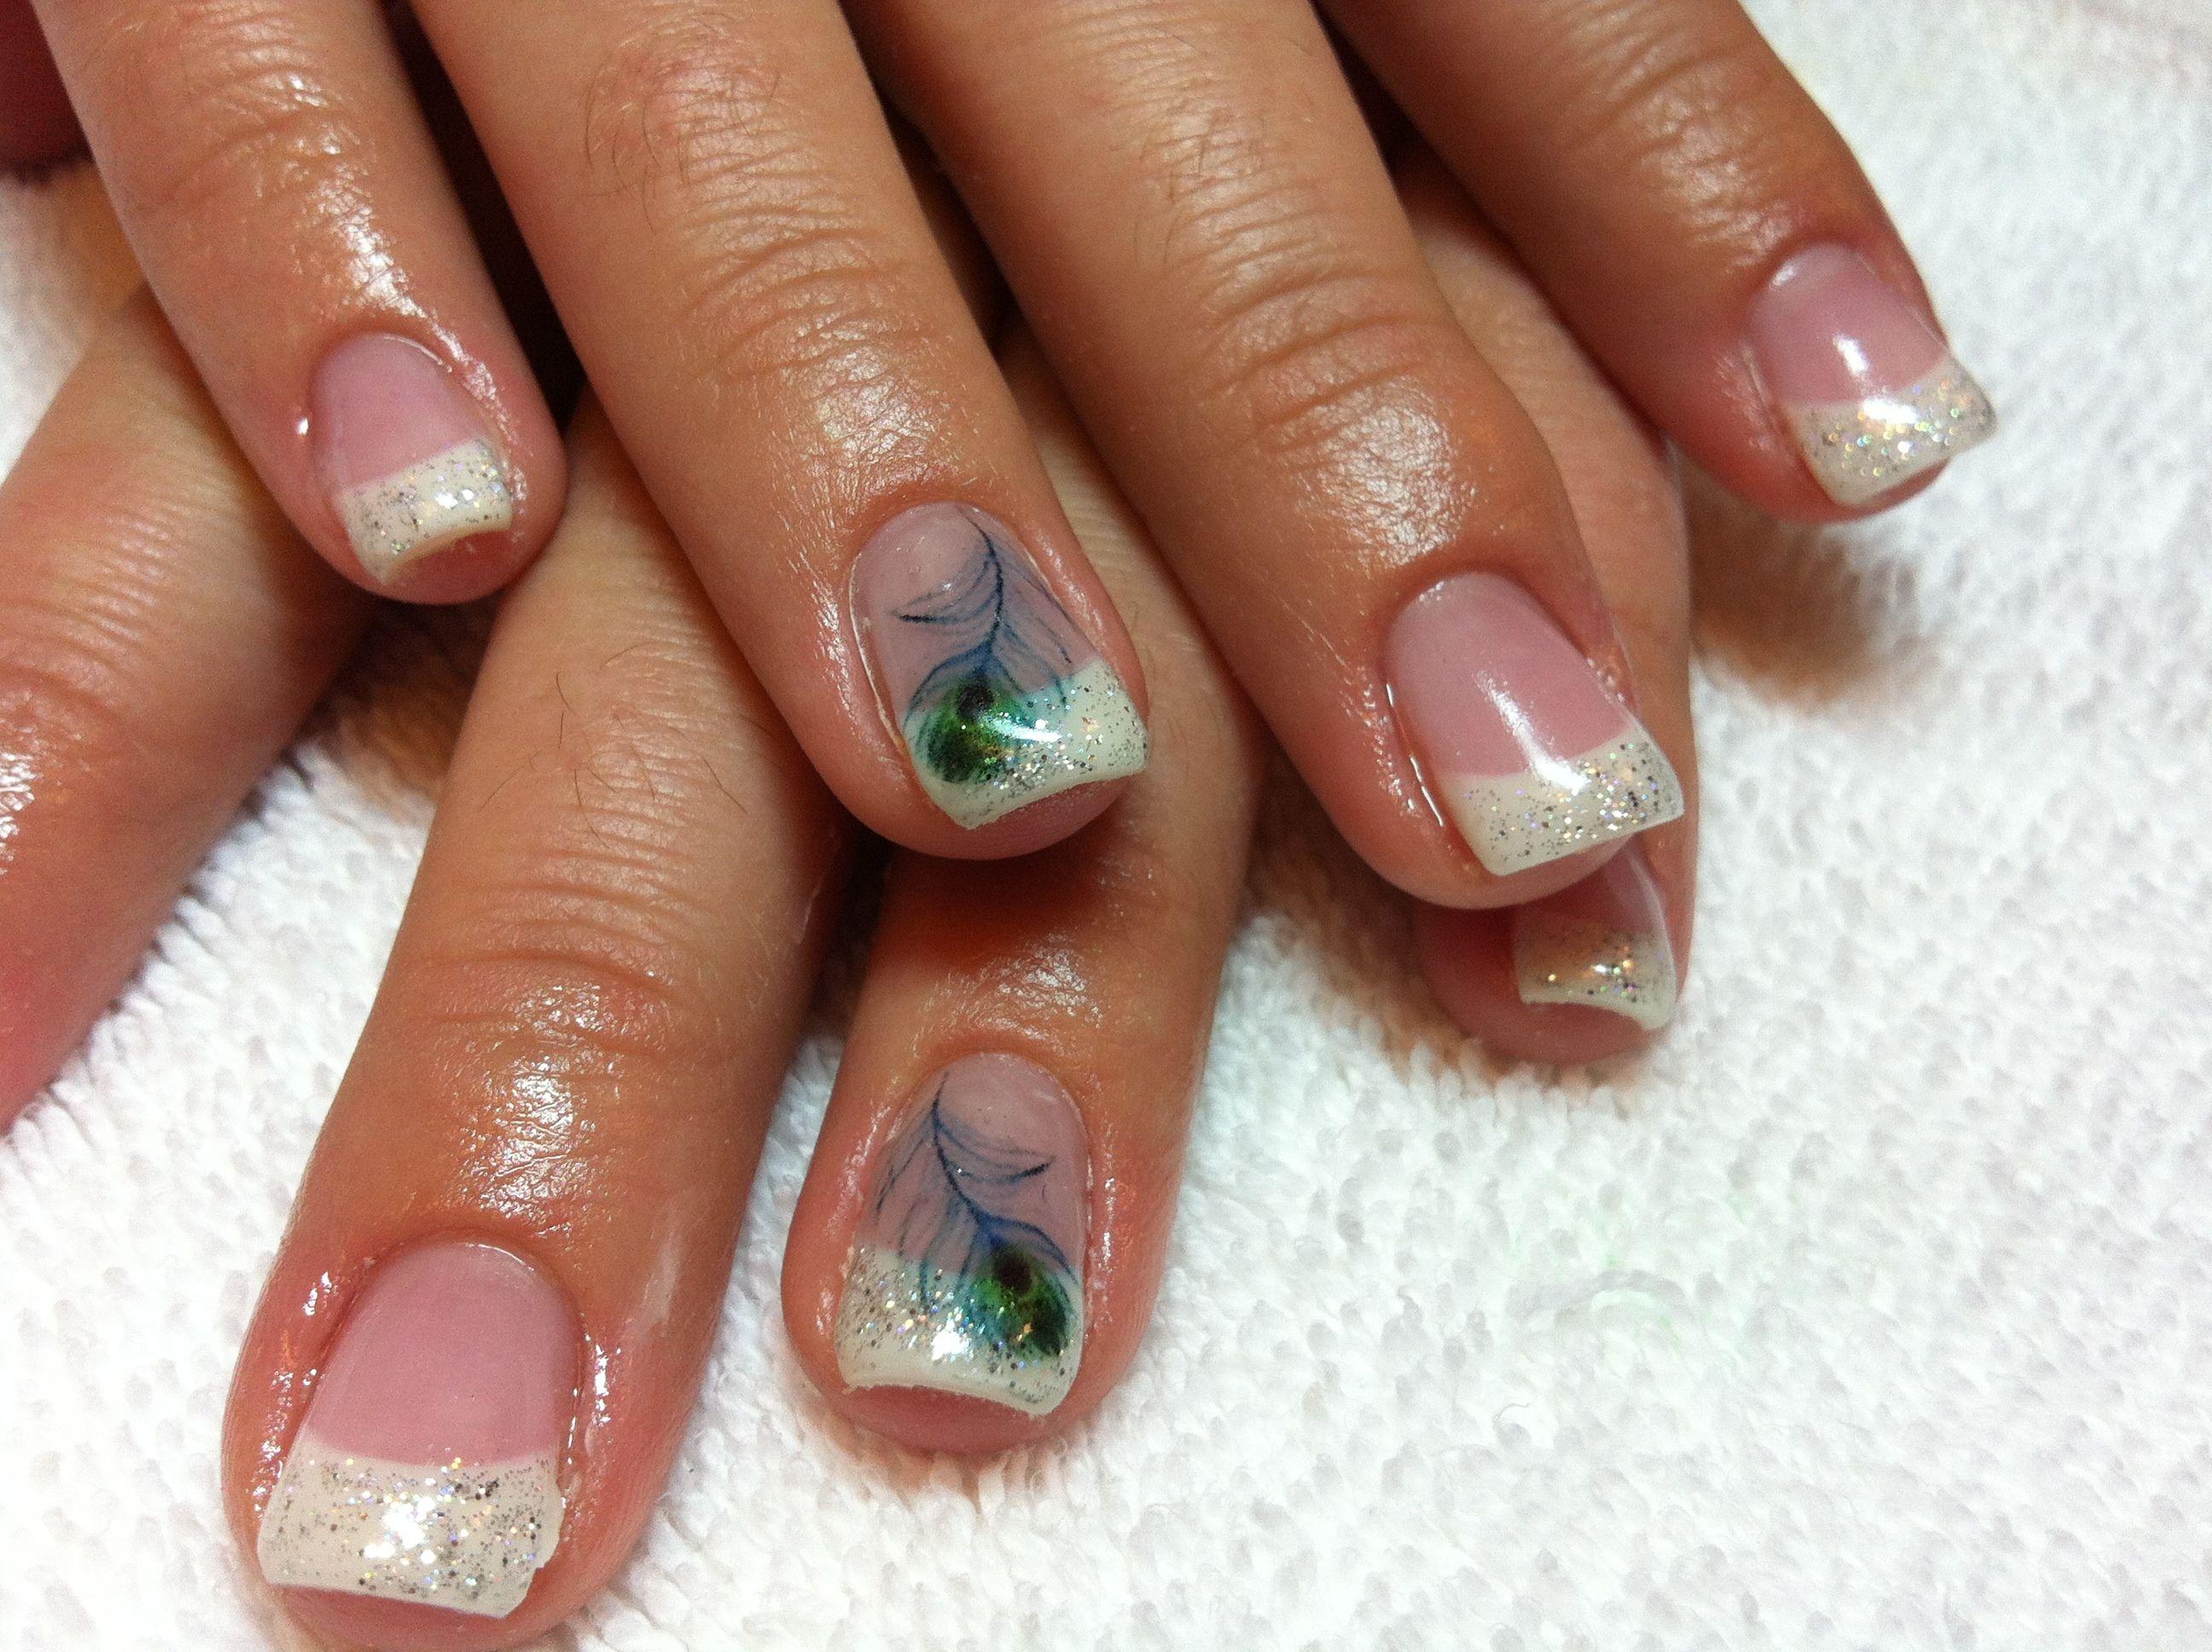 peacock bling | peacock nail designs, glitter nail designs and